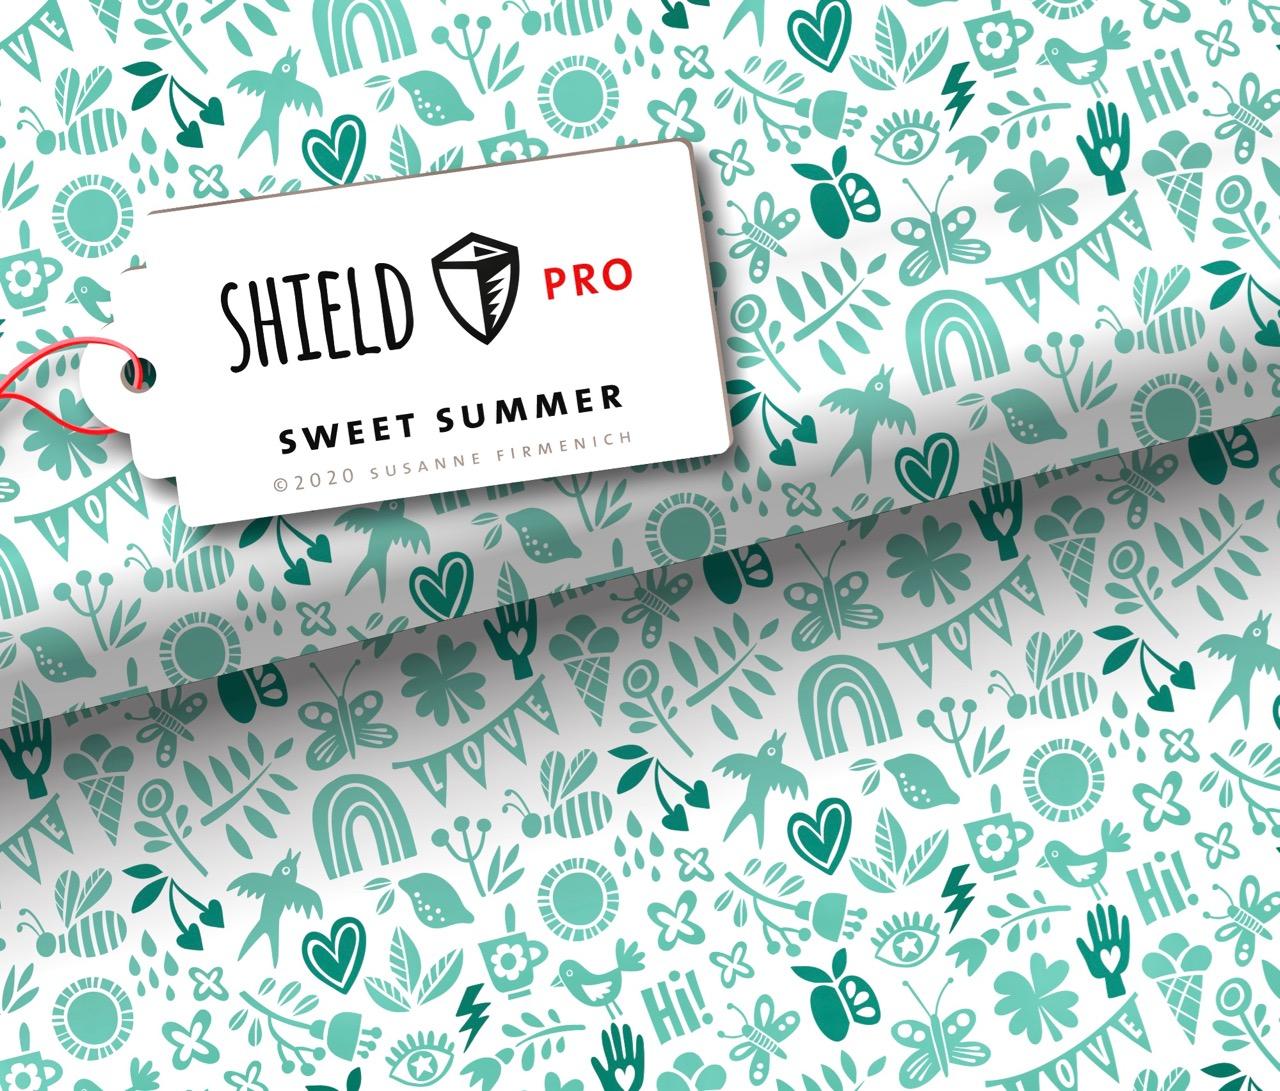 Shield Pro - Sweet Summer Mint von Hamburger Liebe & Albstoffe - antimikrobiell